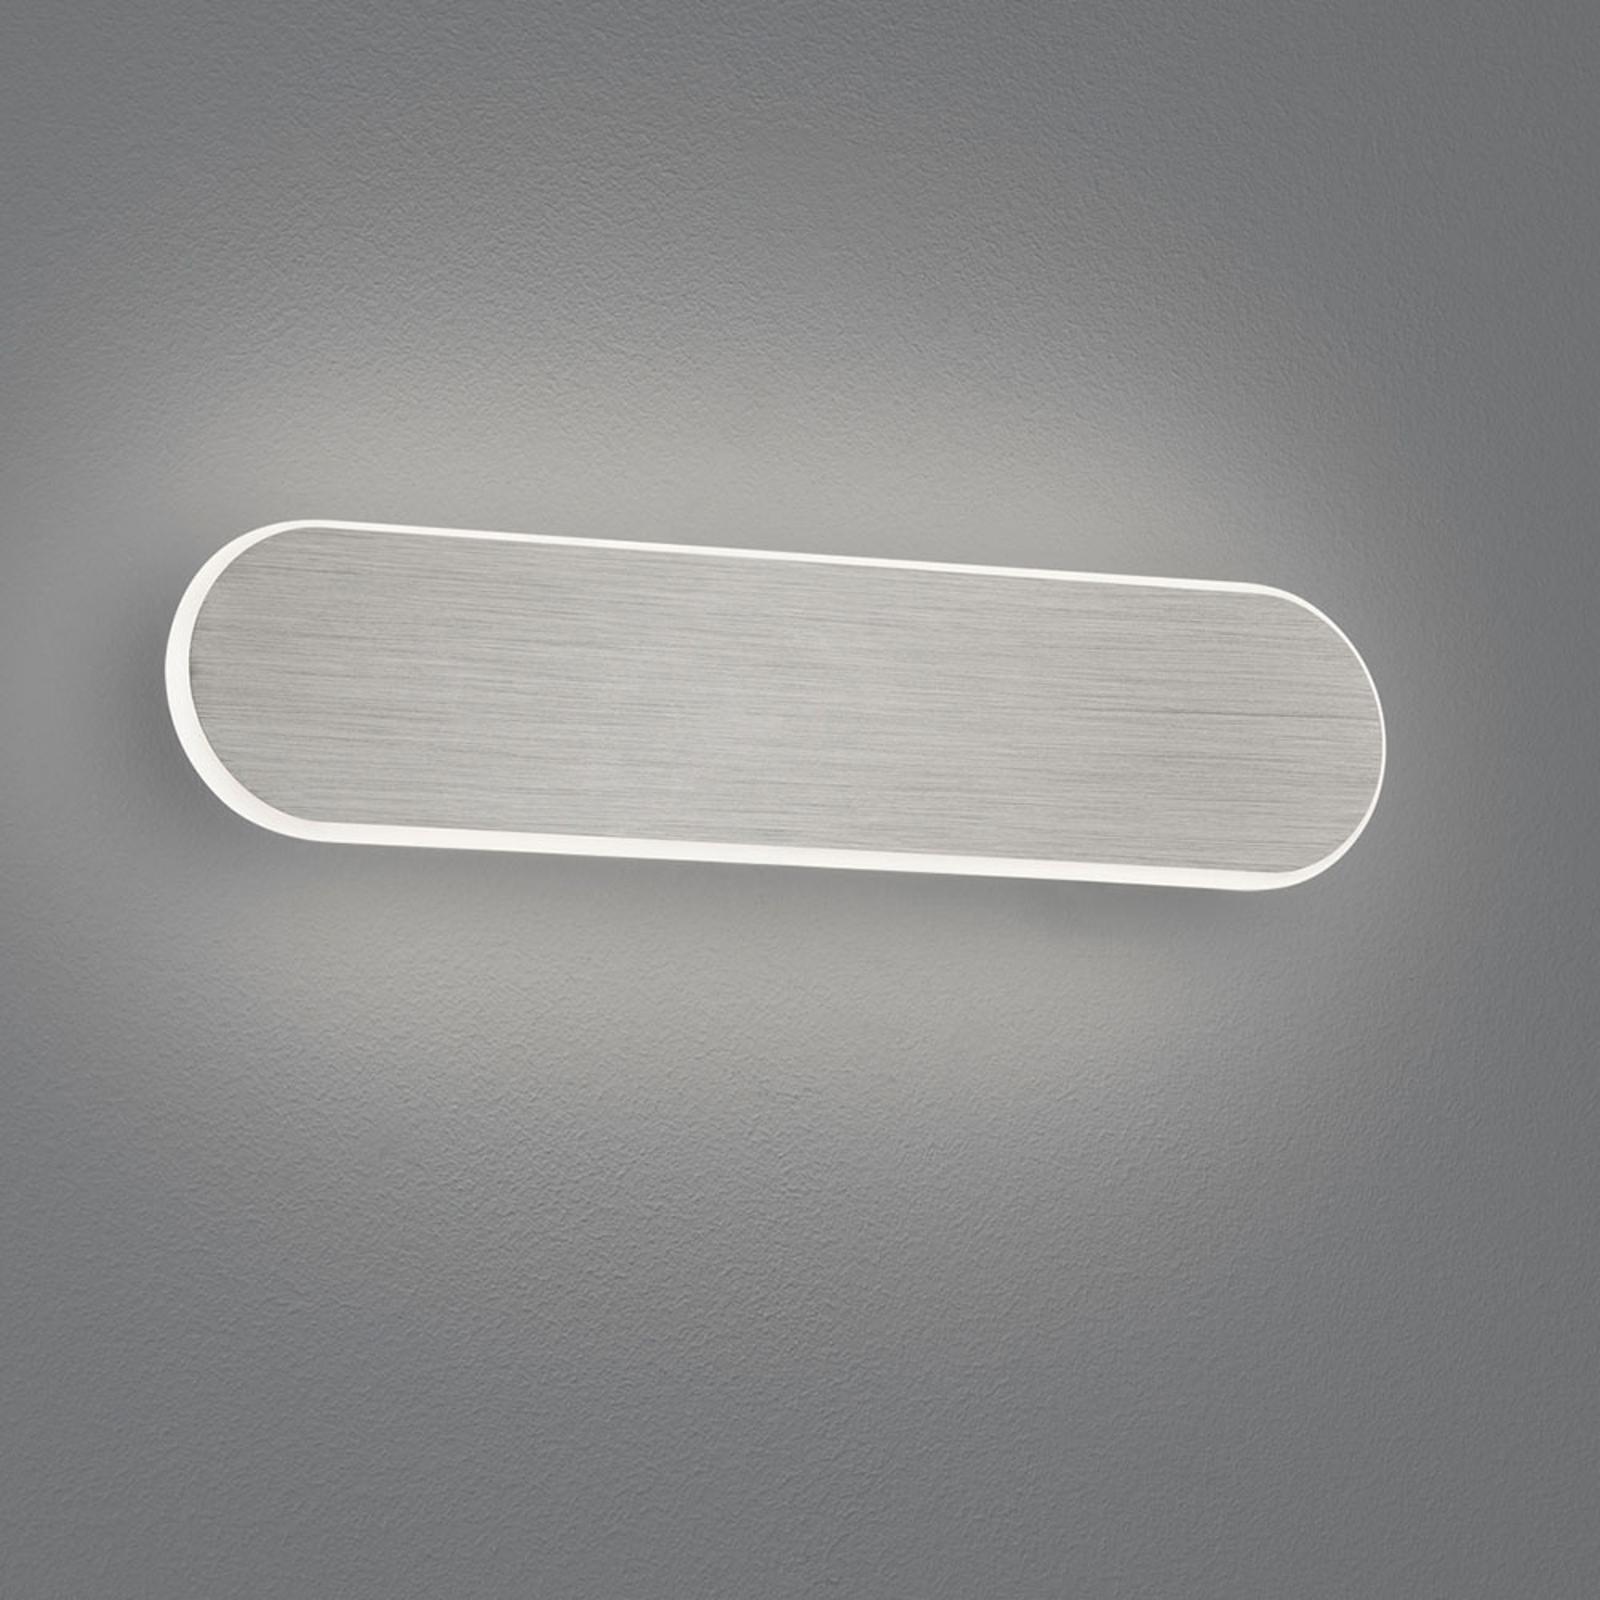 LED-vegglampe Carlo, Switchdim, 35 cm, matt nikkel